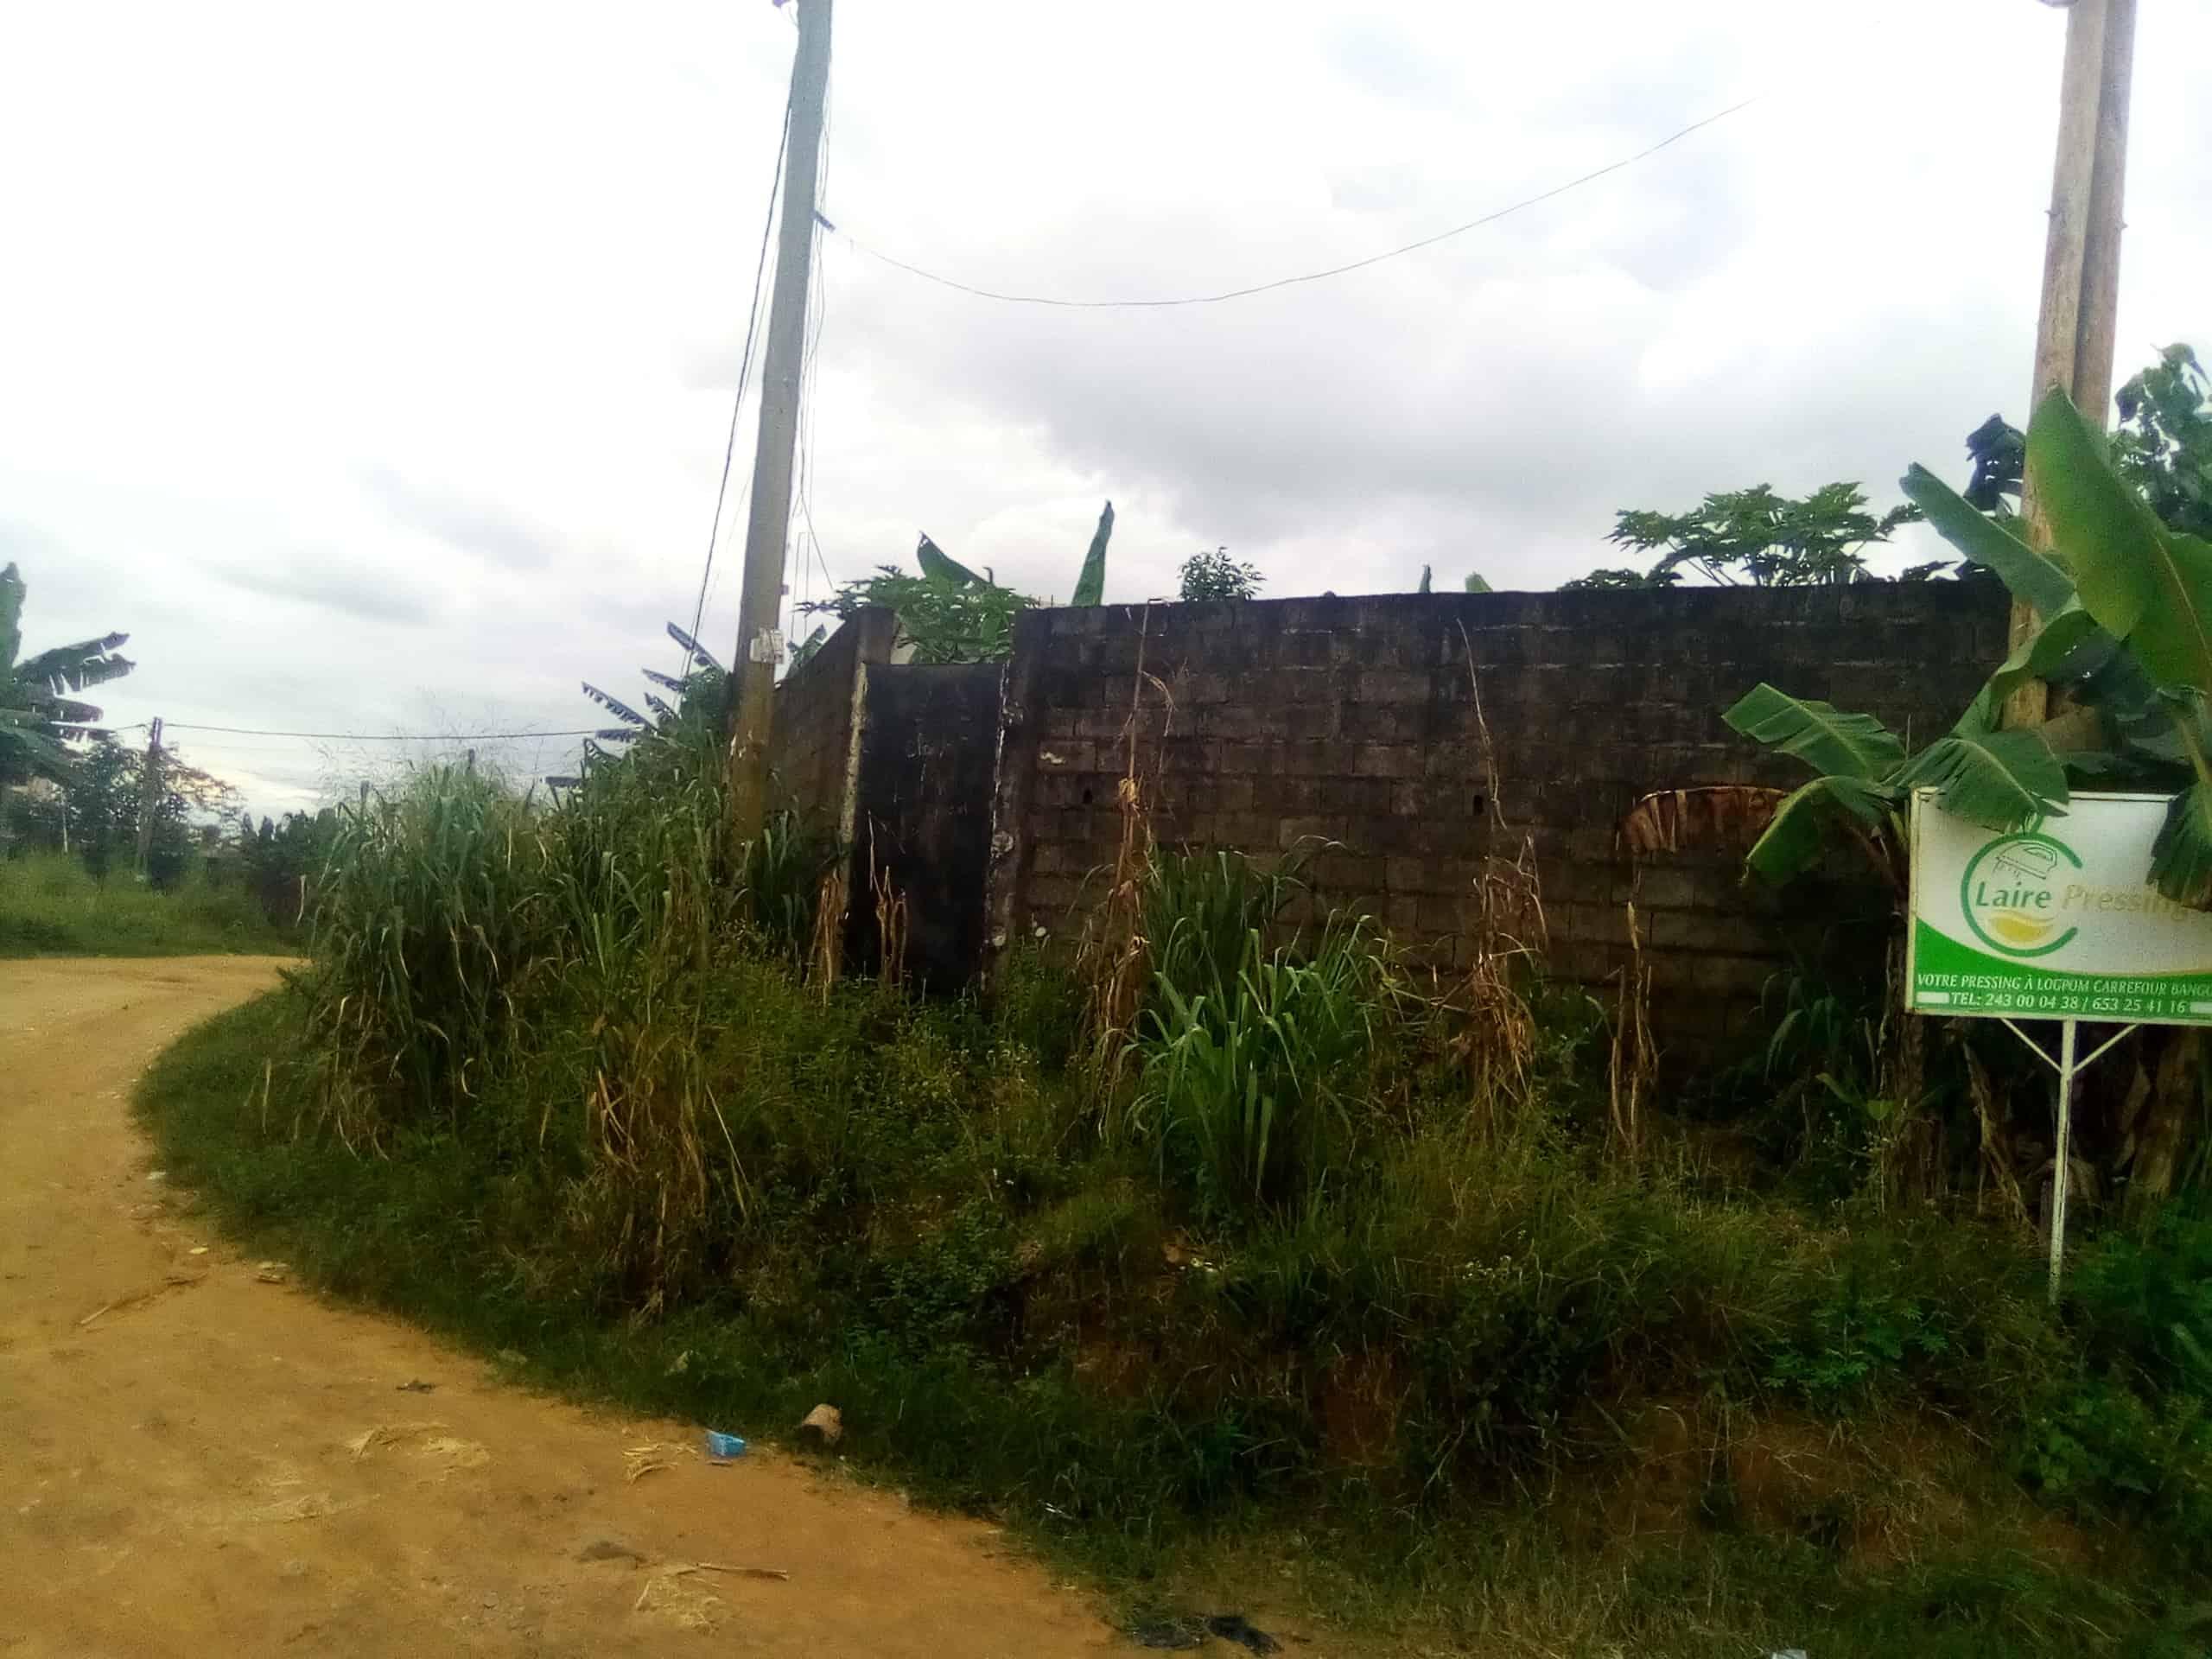 Land for sale at Douala, Logpom, Bangos en route - 500 m2 - 22 000 000 FCFA